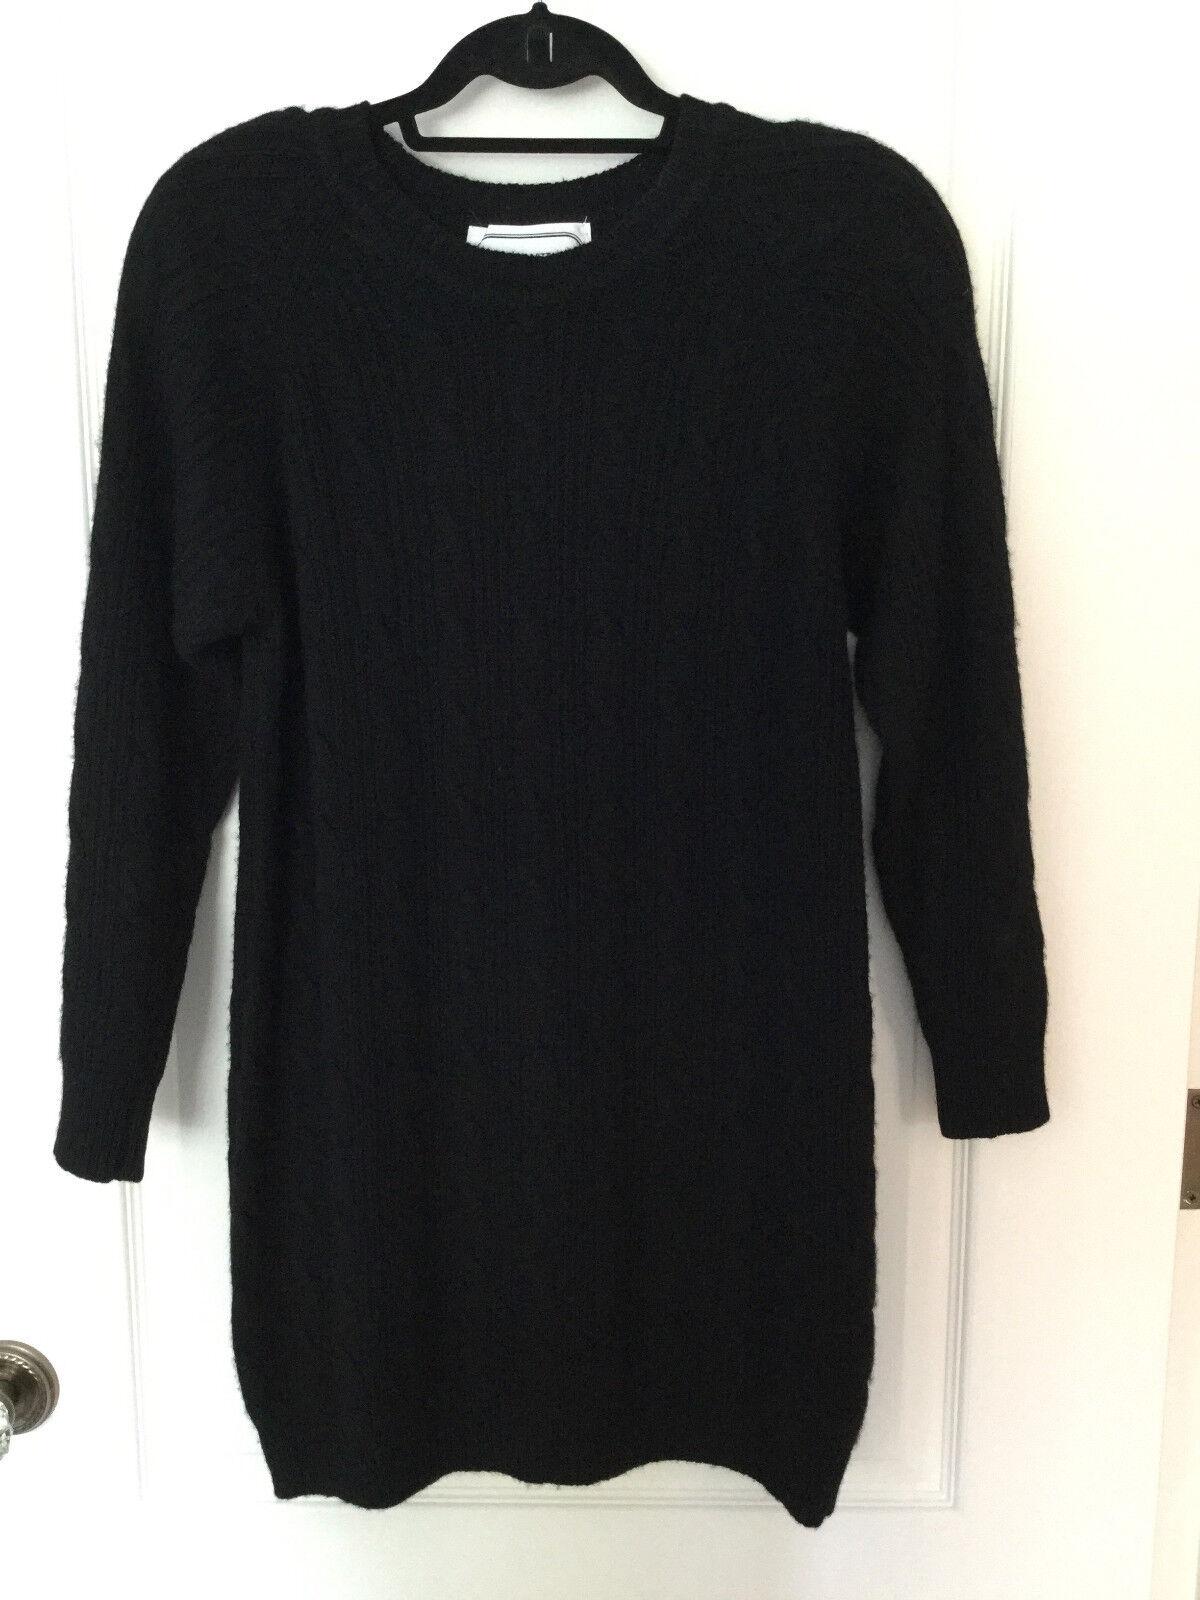 Adrienne Vittadini Cable Knit Cashmere Dress